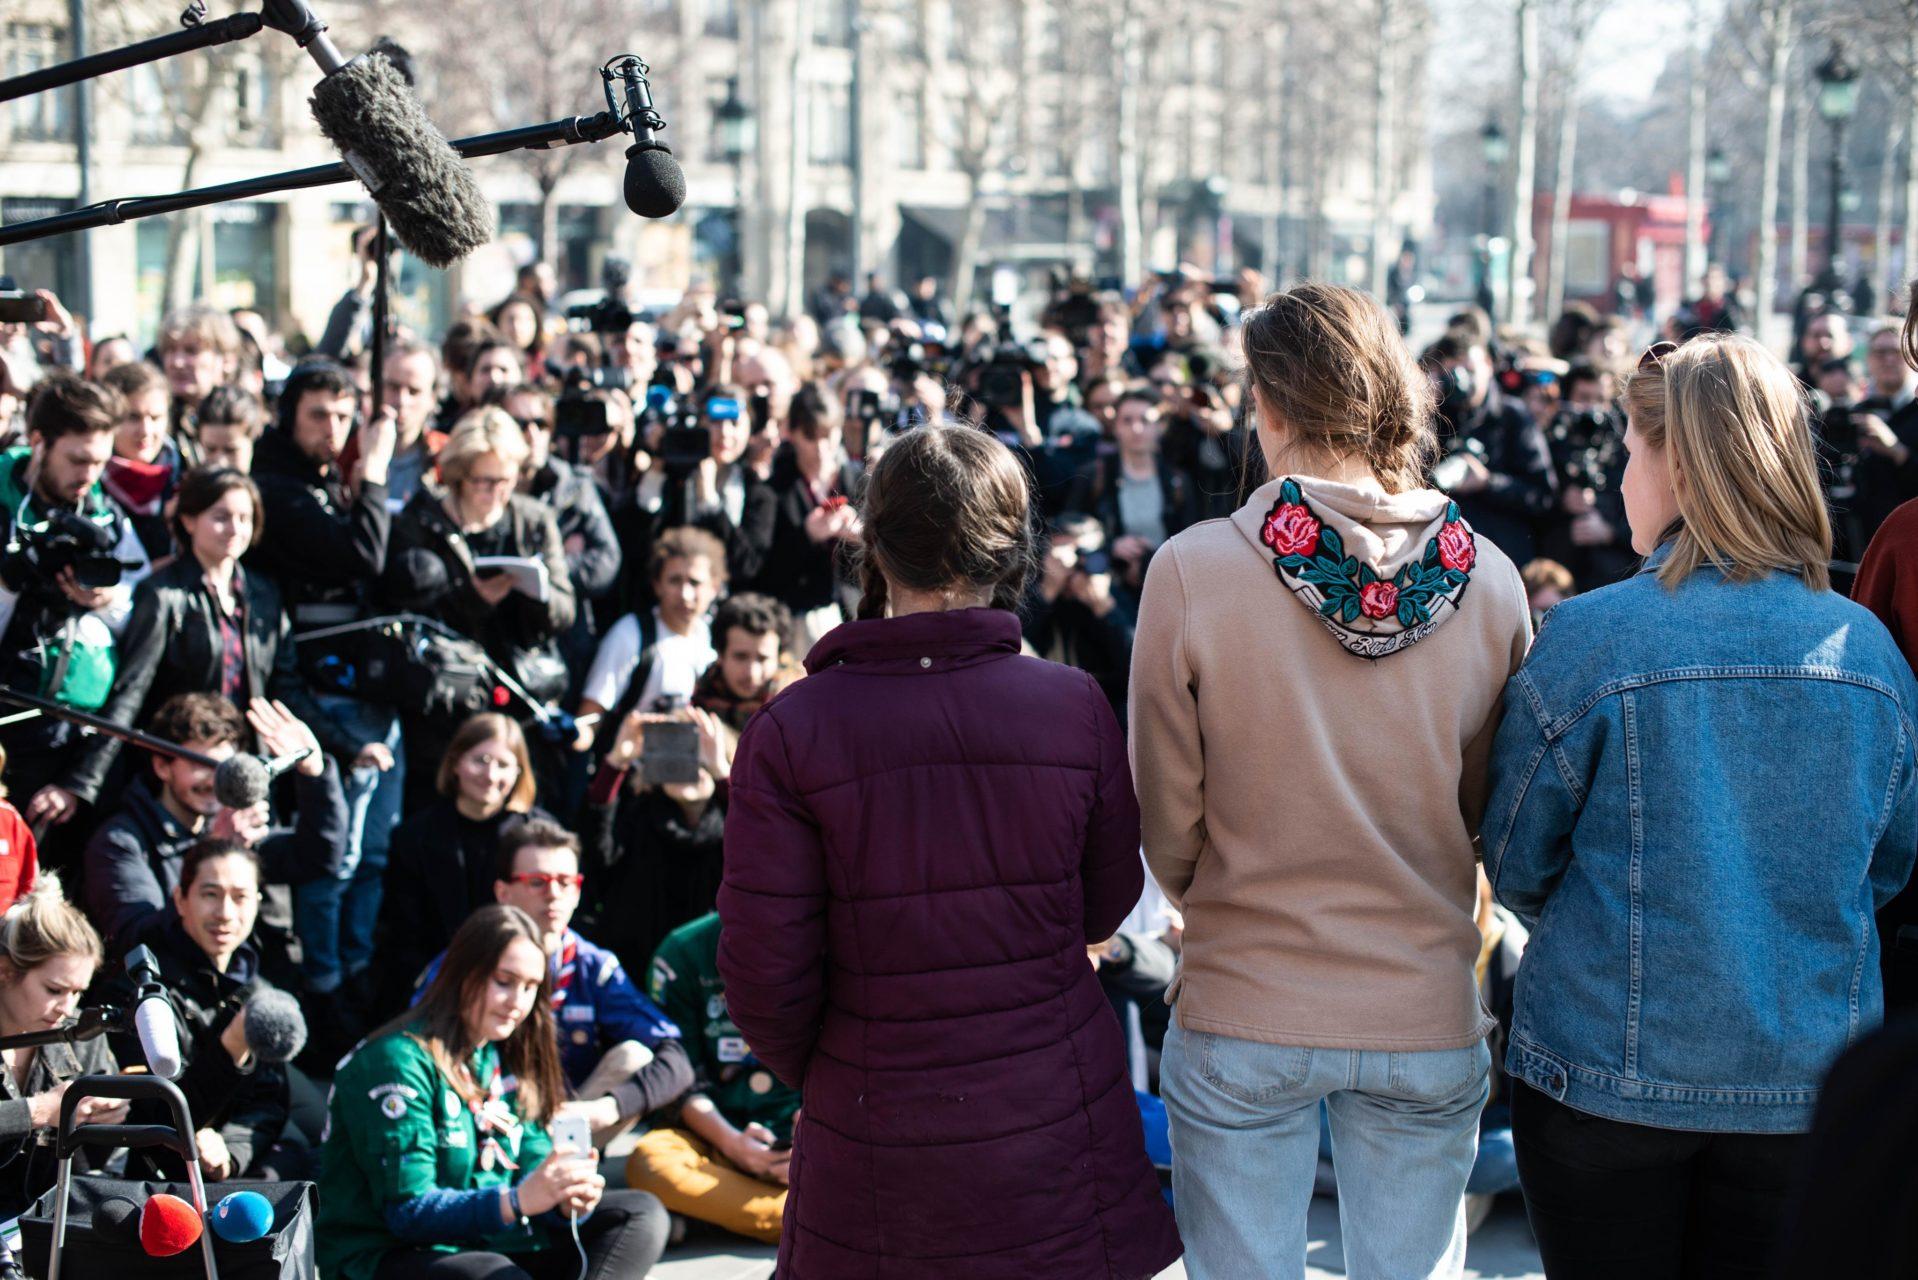 Greta Thunberg and the medias